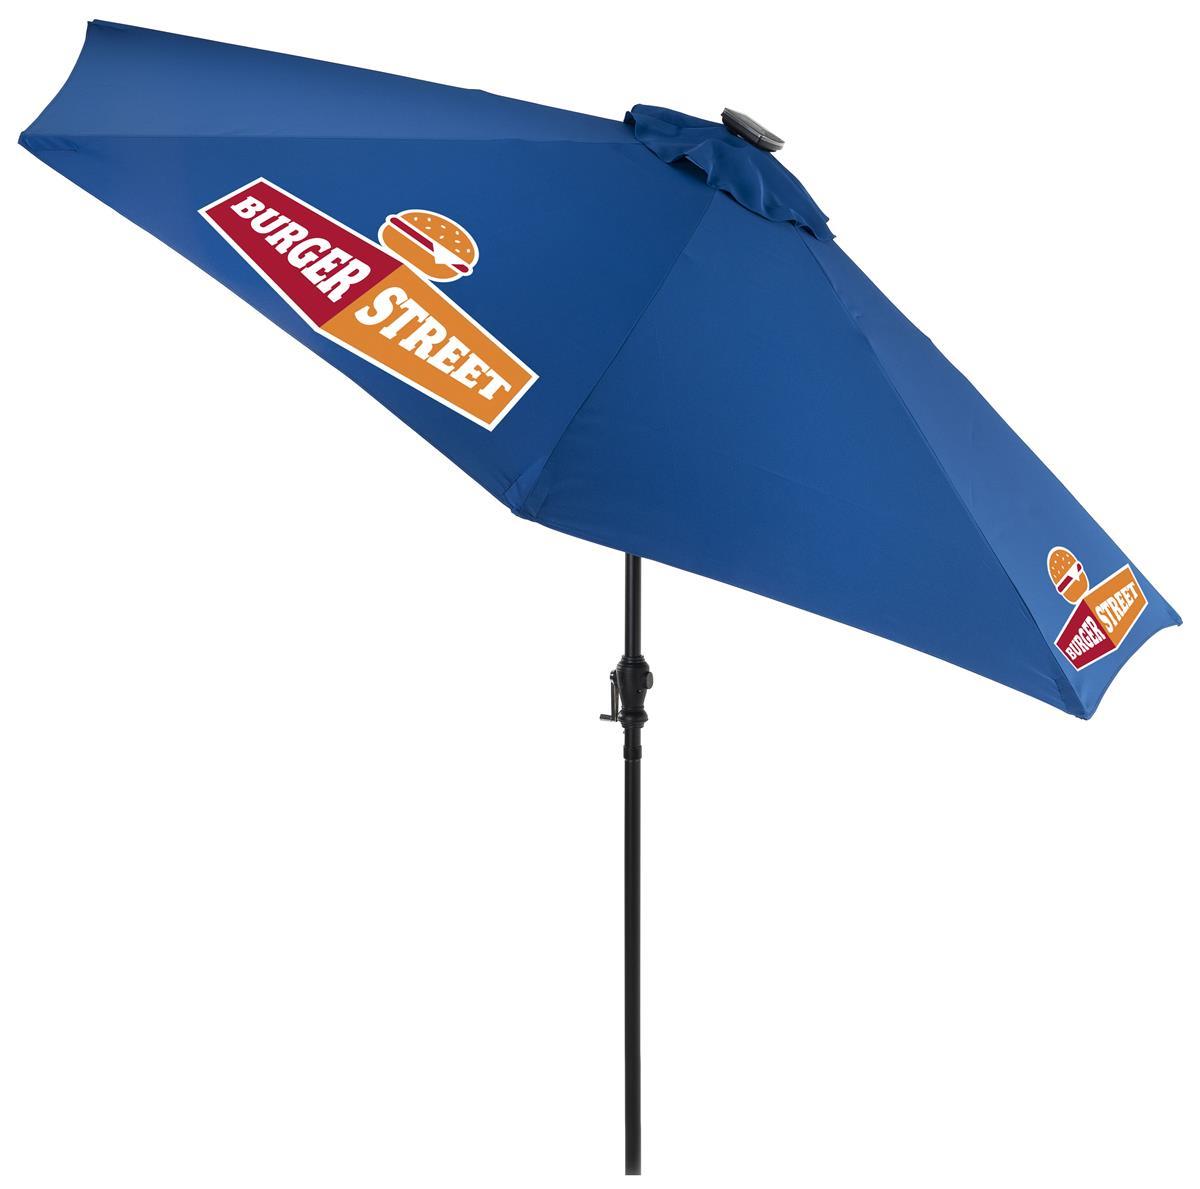 9 patio umbrella 3 color printing and led lights solar powered royal blue